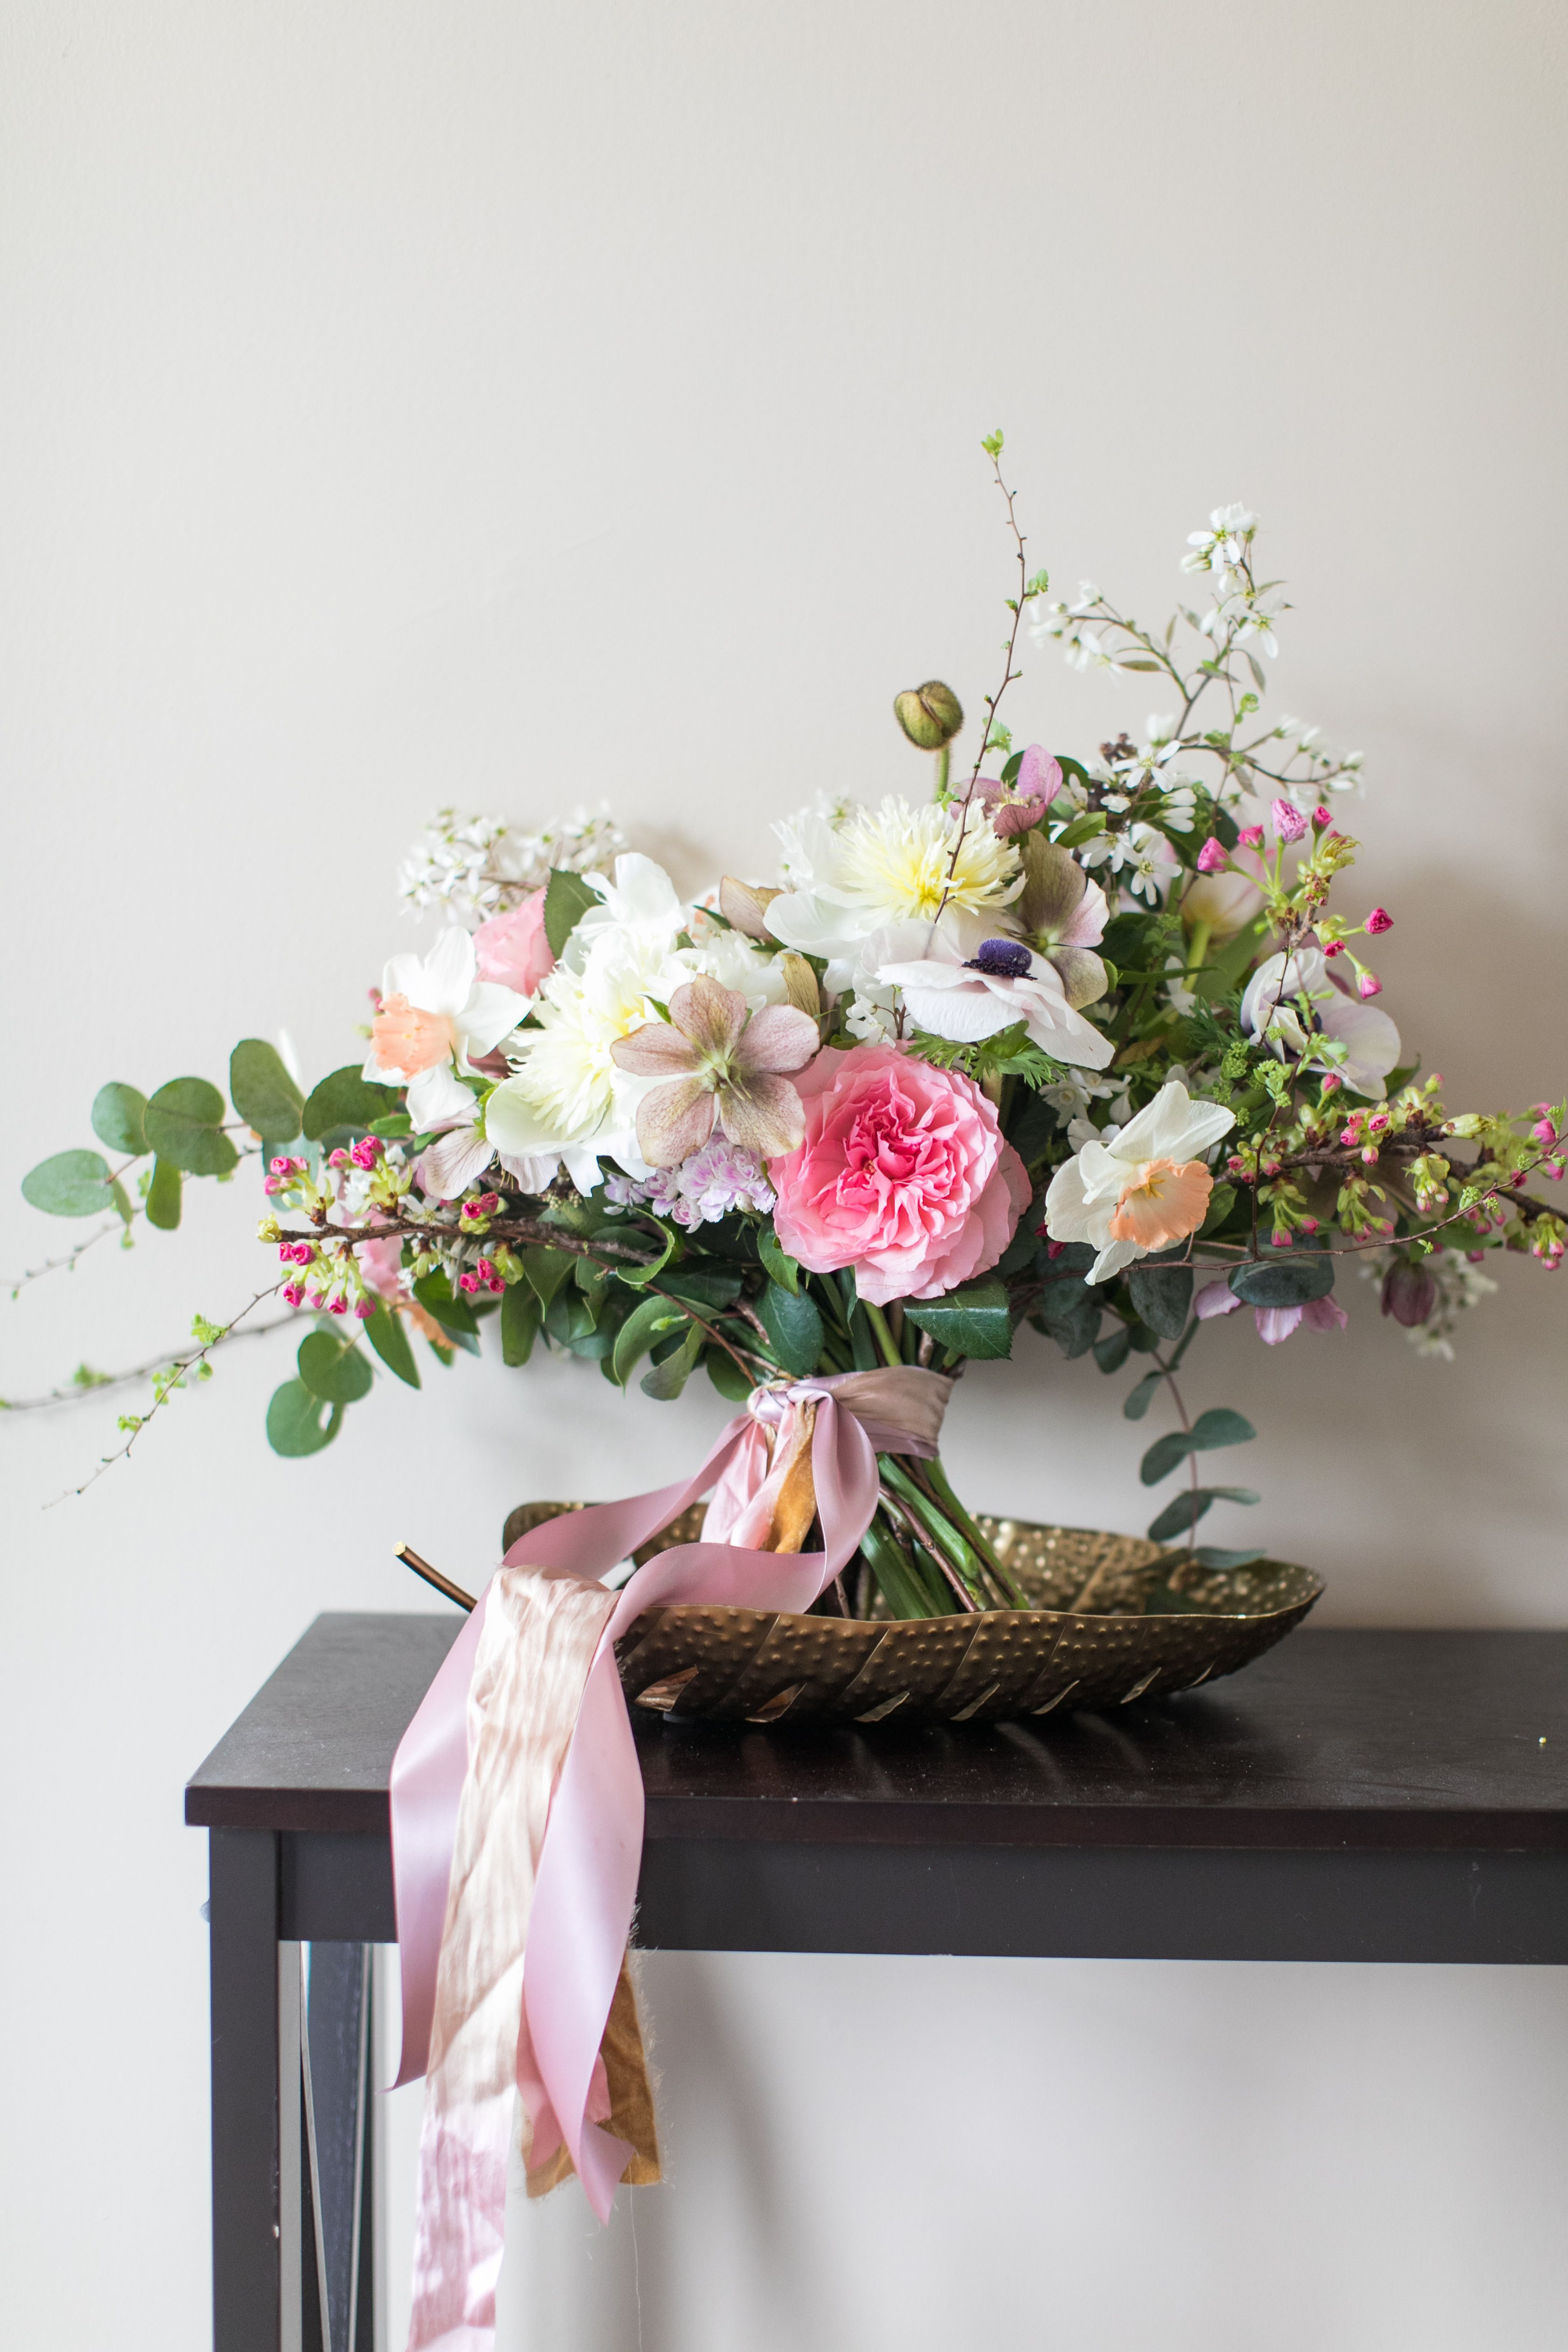 Rosewood farms florist nj florist aisle decor